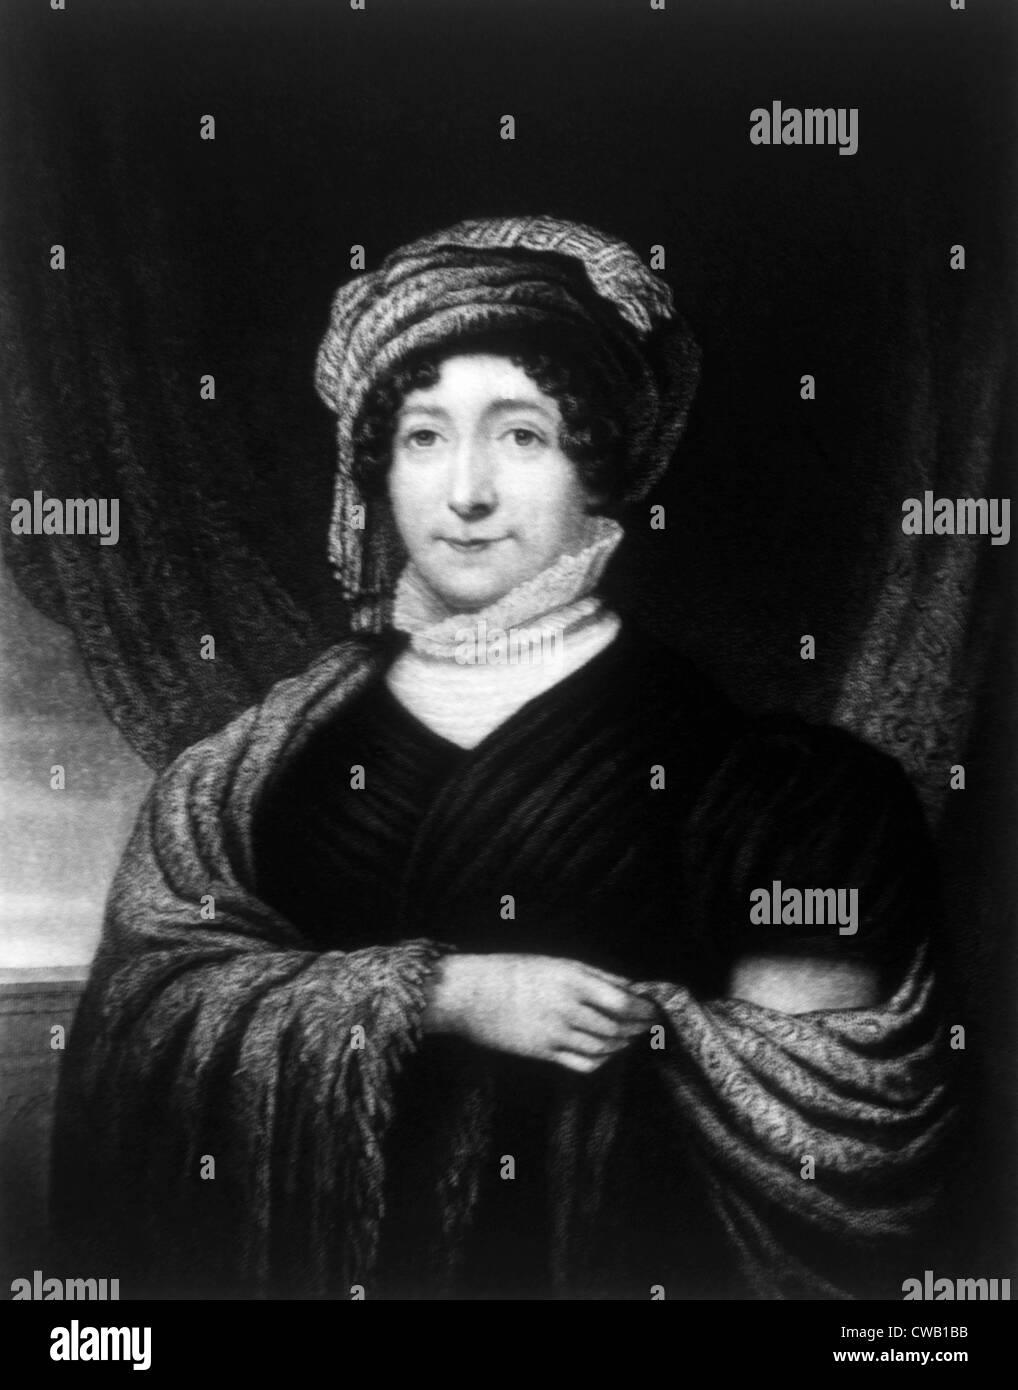 Dolley Madison (1768-1849), la Primera Dama (1809-1817) Imagen De Stock